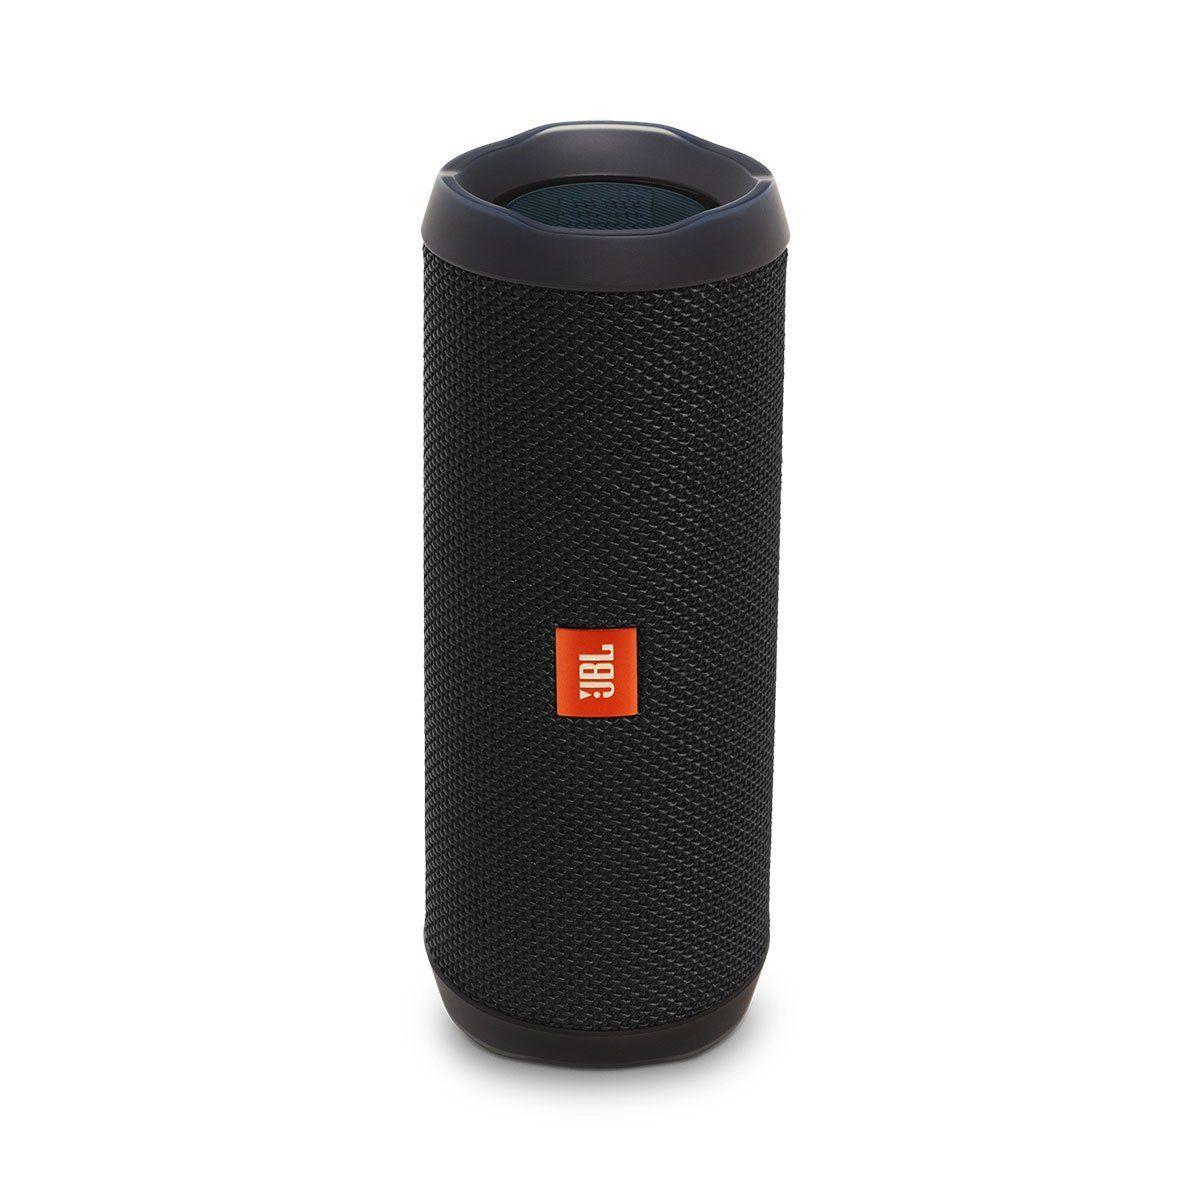 Jbl Flip 4 Waterproof Portable Bluetooth Speaker Black Electronics イヤホン